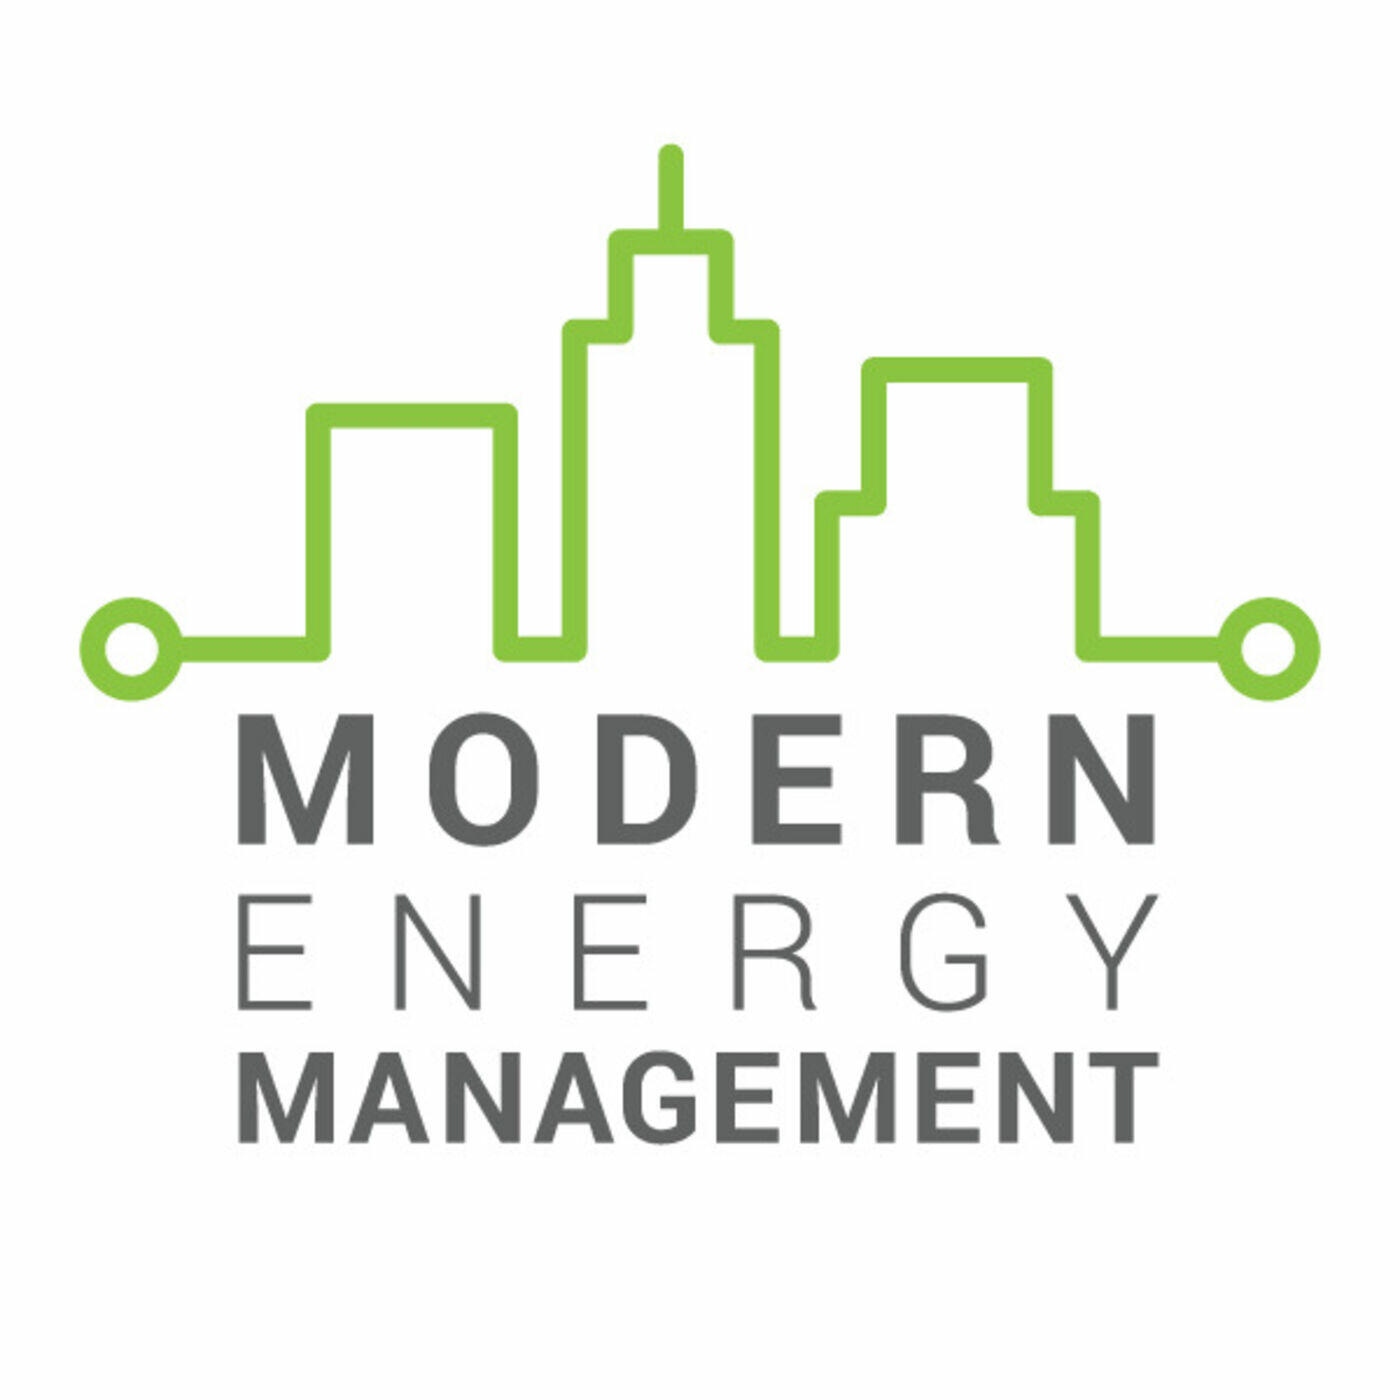 Modern Energy Management